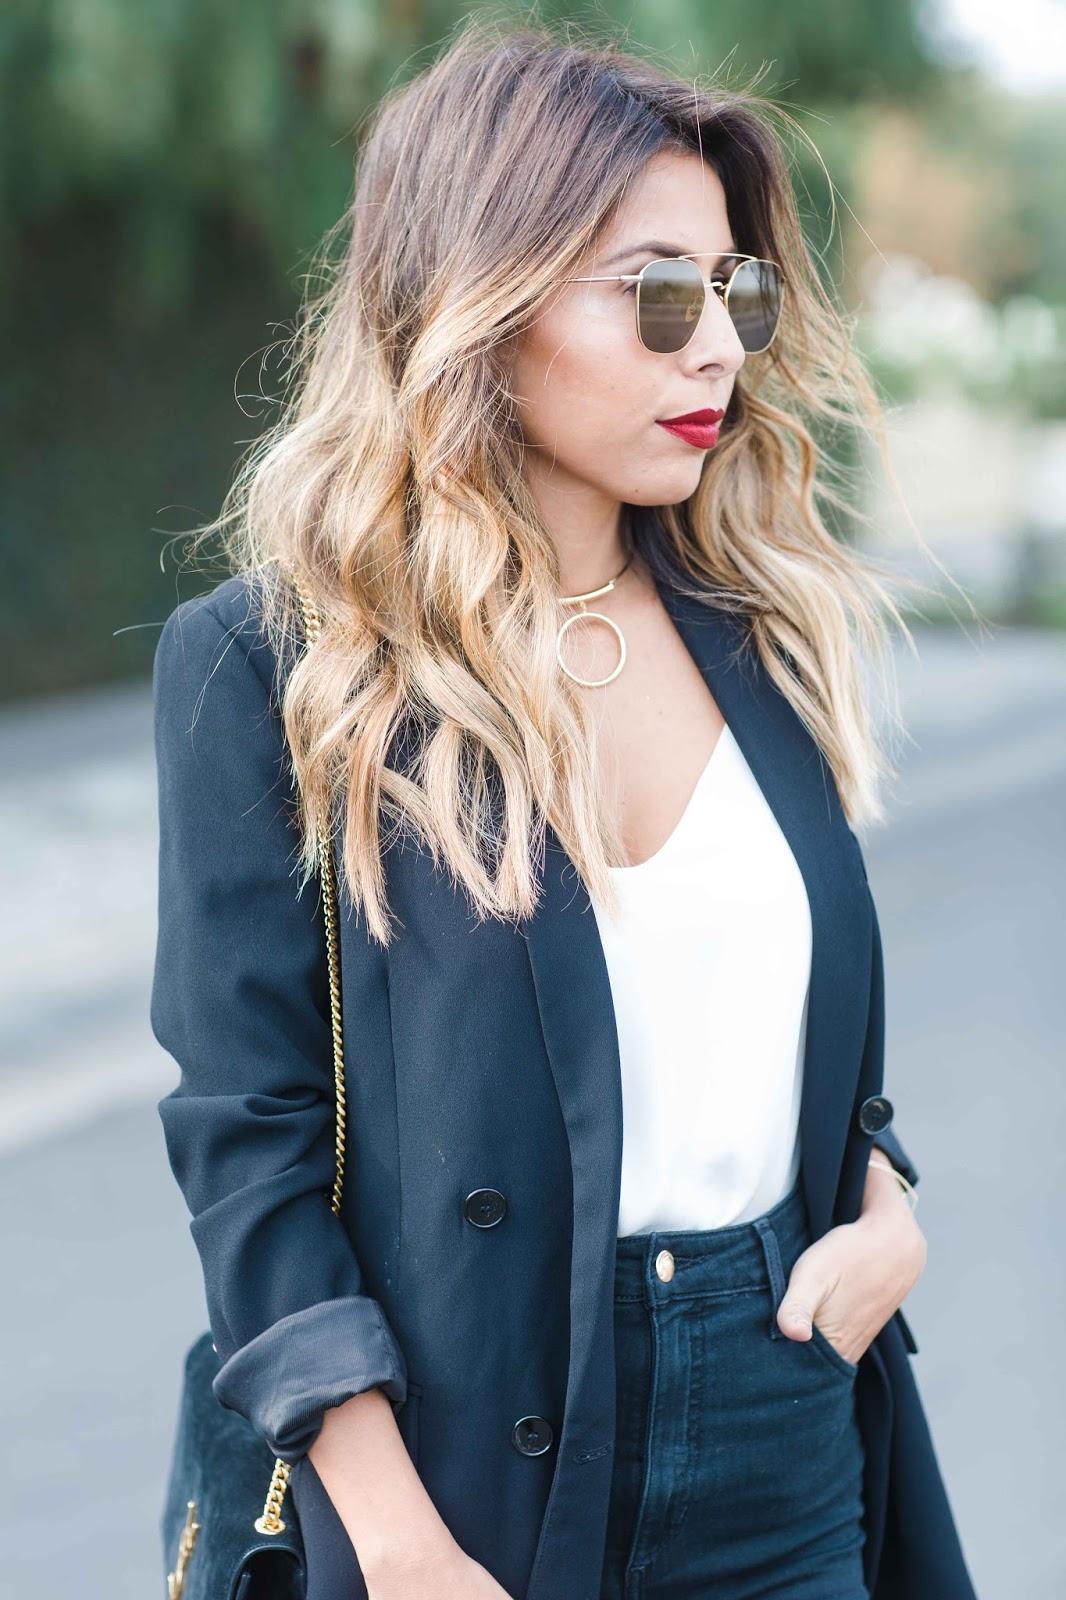 how to wear oversized blazer, blazer outfit, what do I need in my closet, oversized blazer and jeans